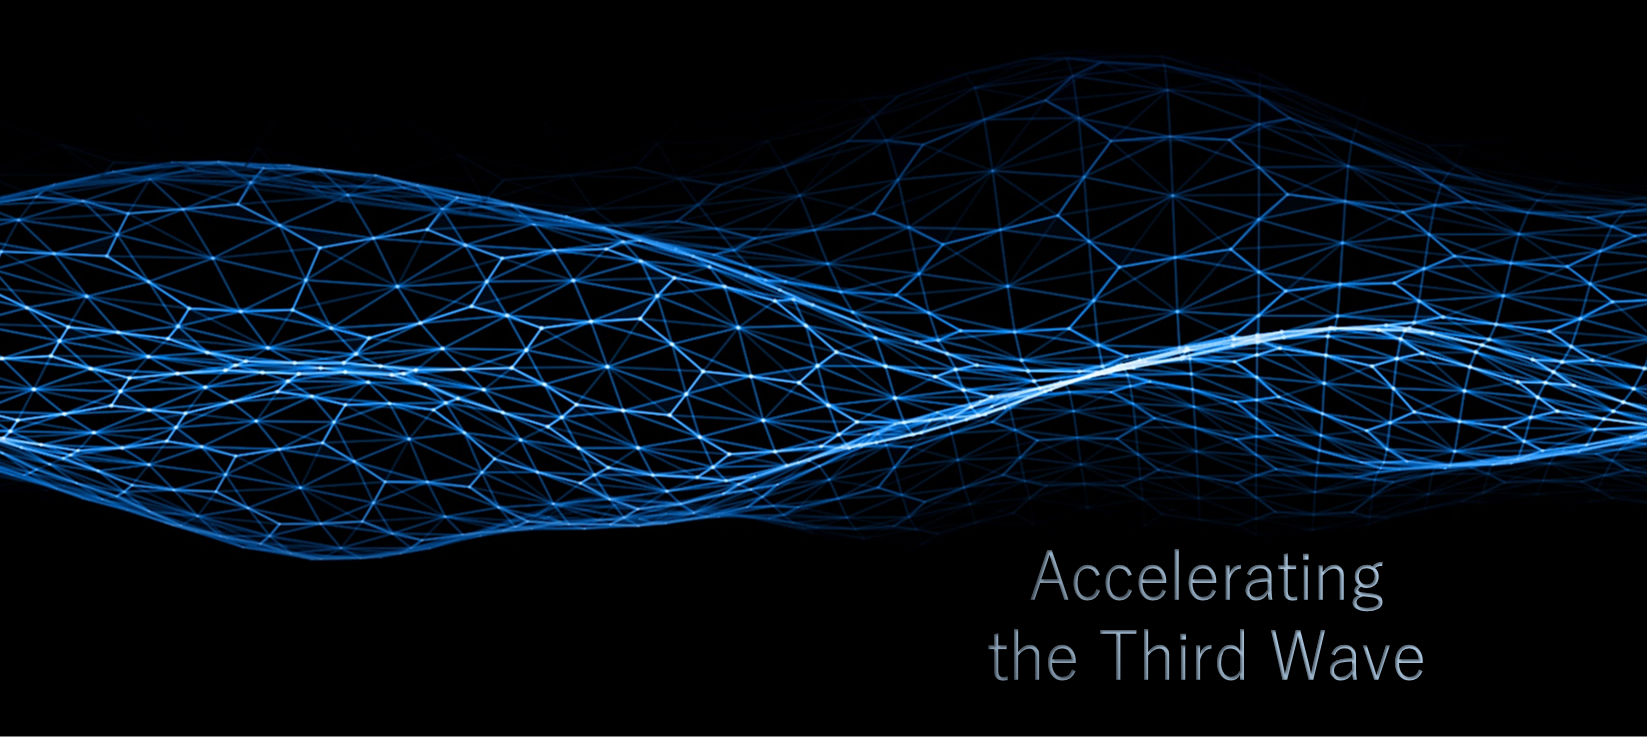 DARPA Announces $2 Billion Campaign to Develop Next Wave of AI ...